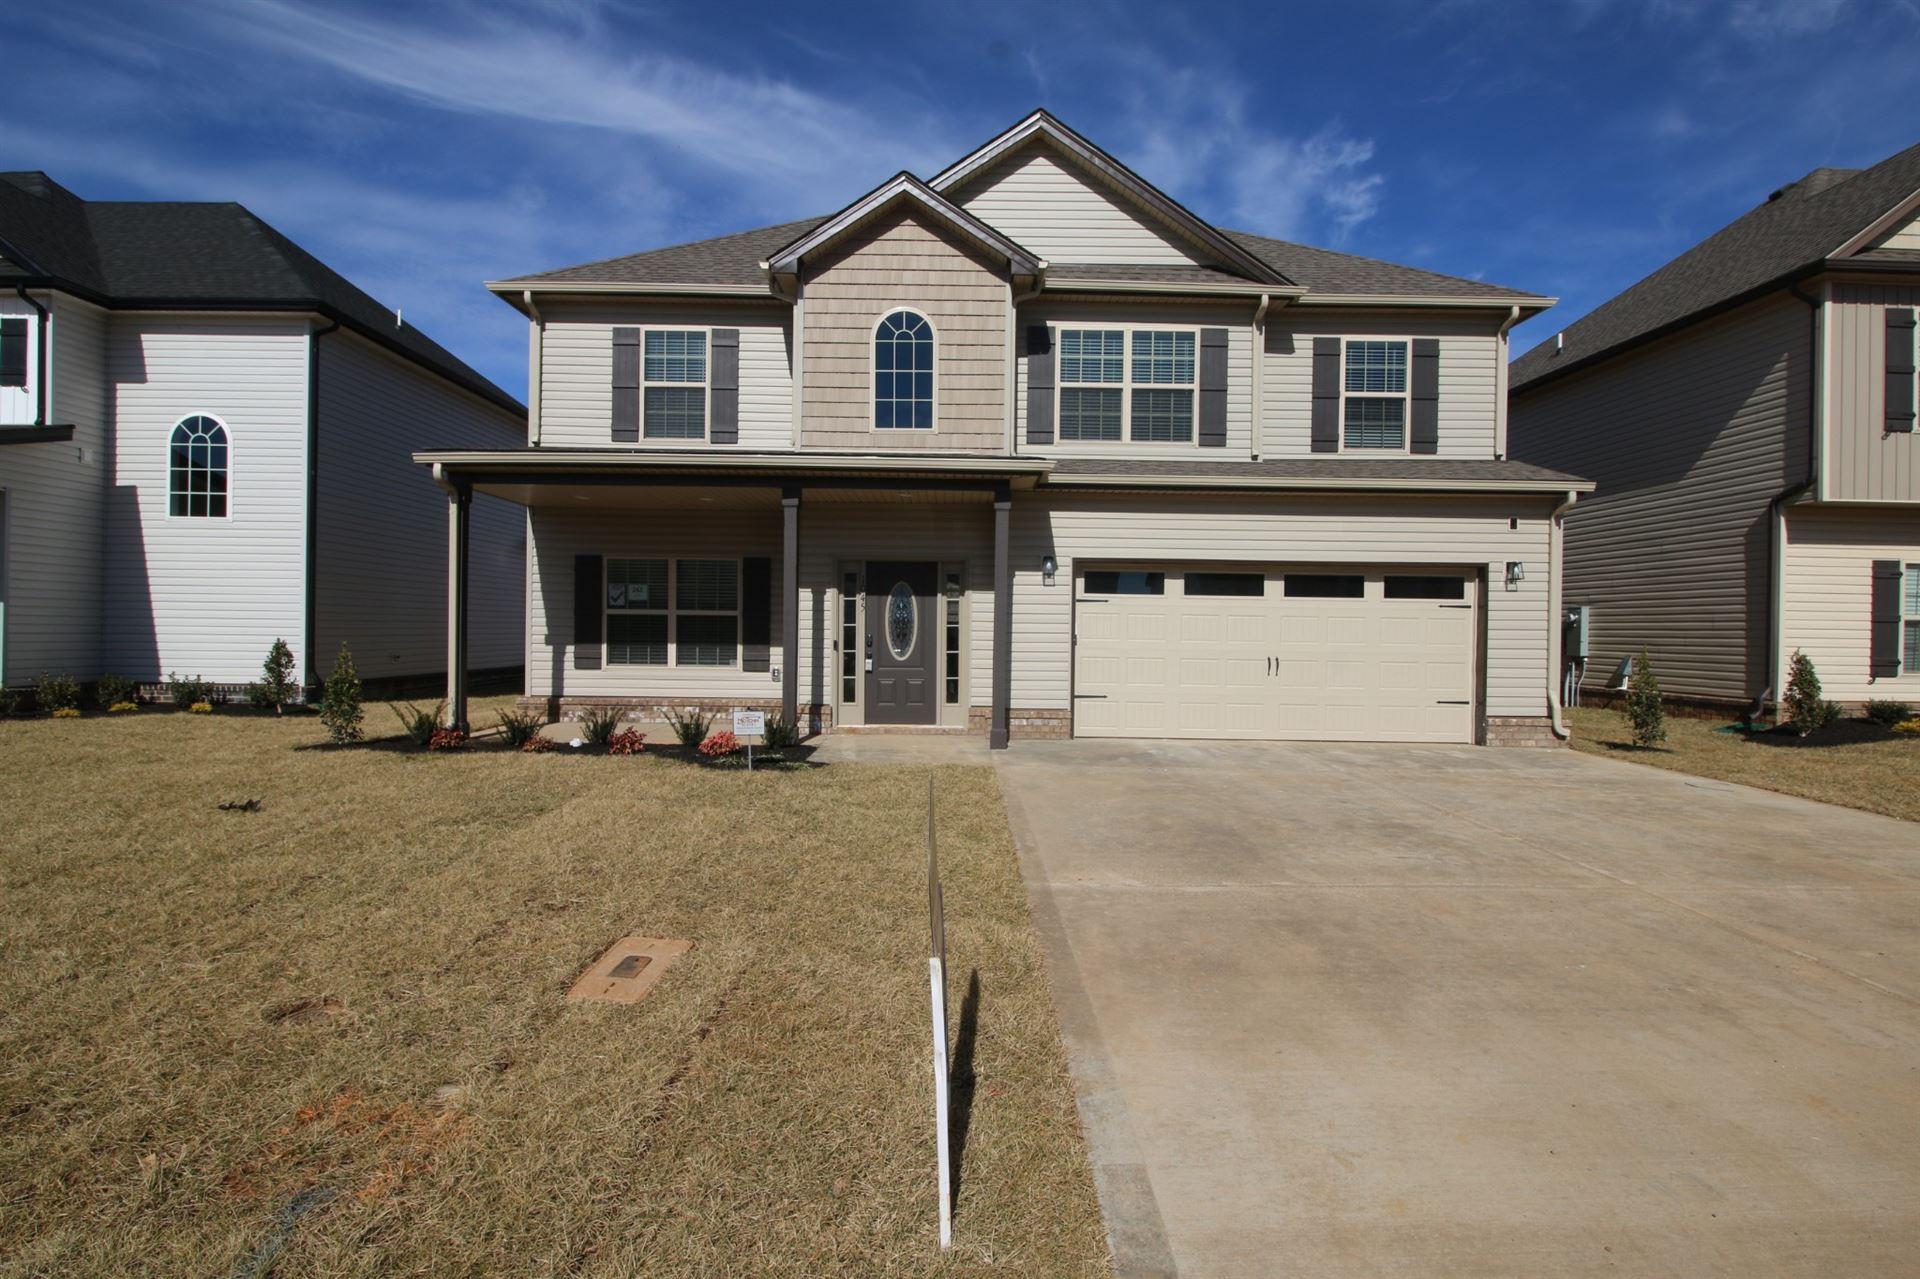 262 Mills Creek, Clarksville, TN 37042 - MLS#: 2297962